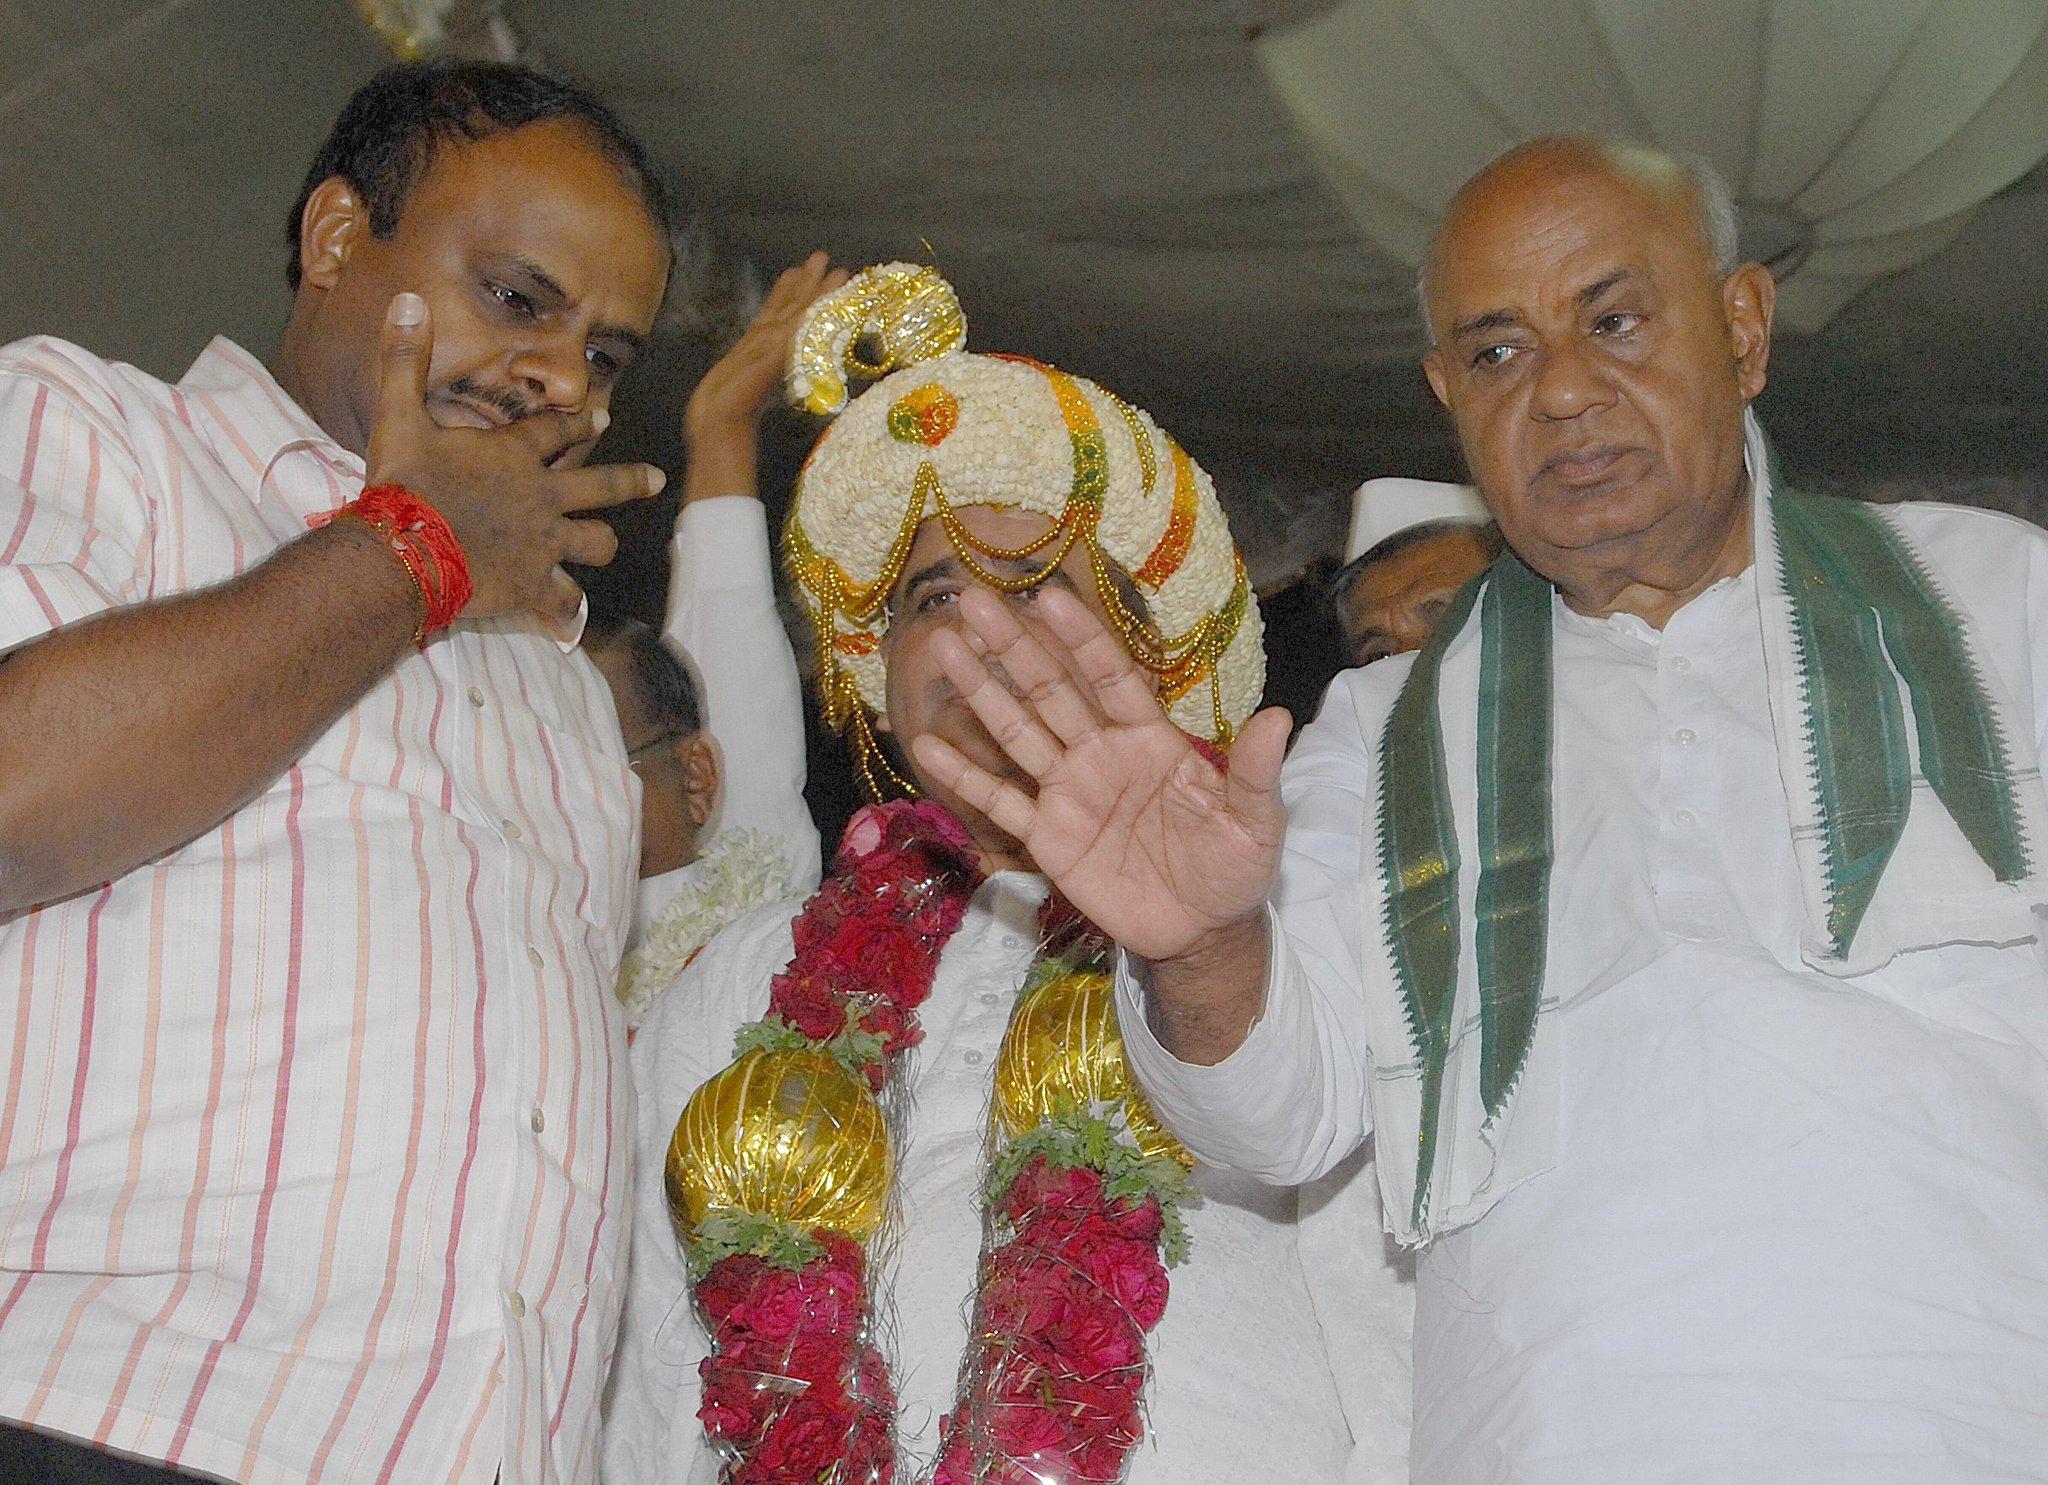 BJP deal tainted son, he's cleansed now: Deve Gowda https://t.co/g54Yknz93q https://t.co/UgYhOj4bqY